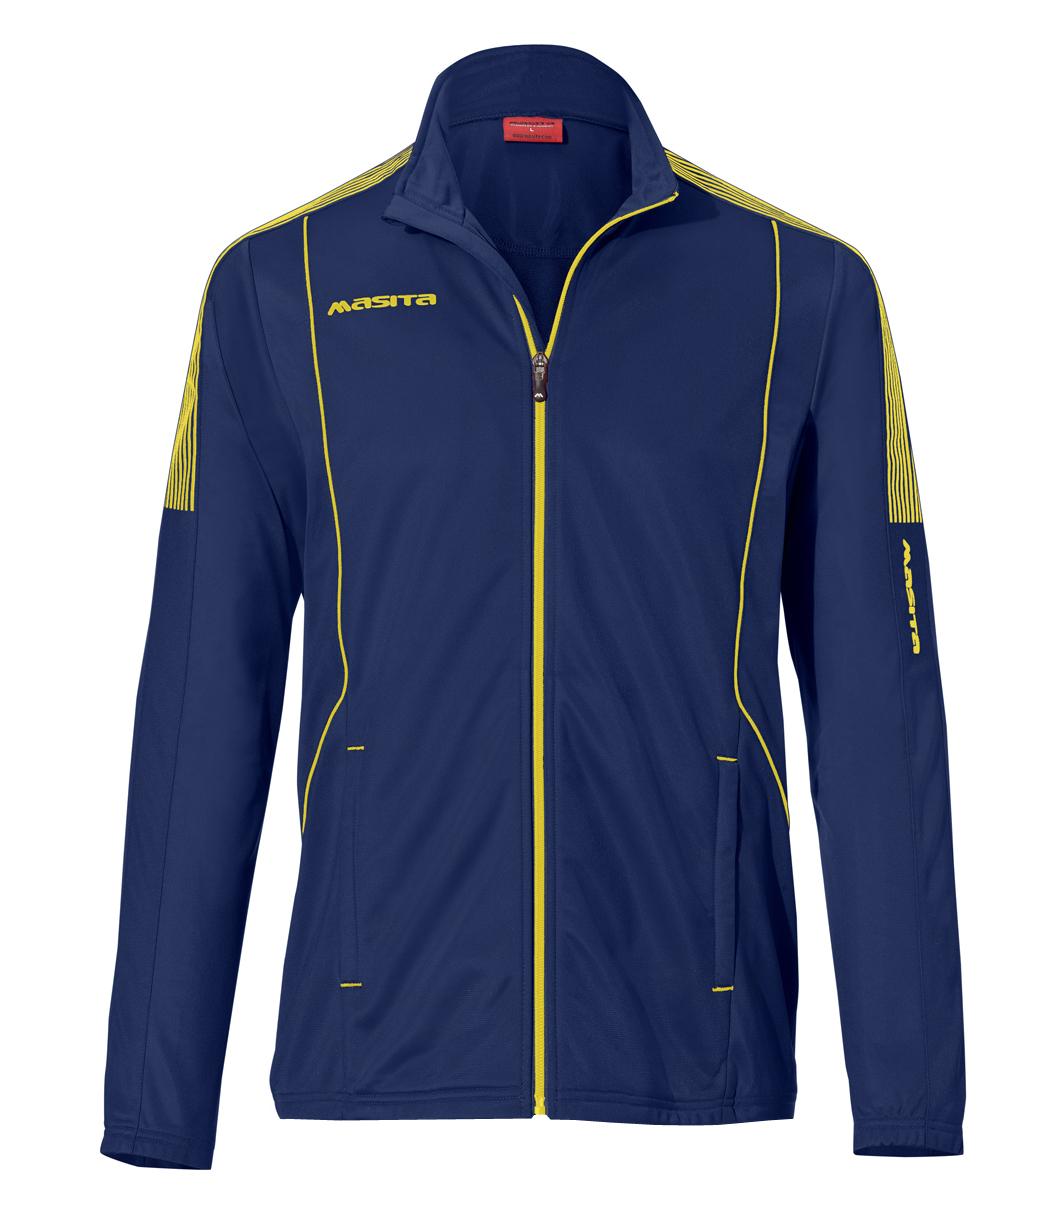 Presentation Jacket Barca  Navy Blue / Yellow